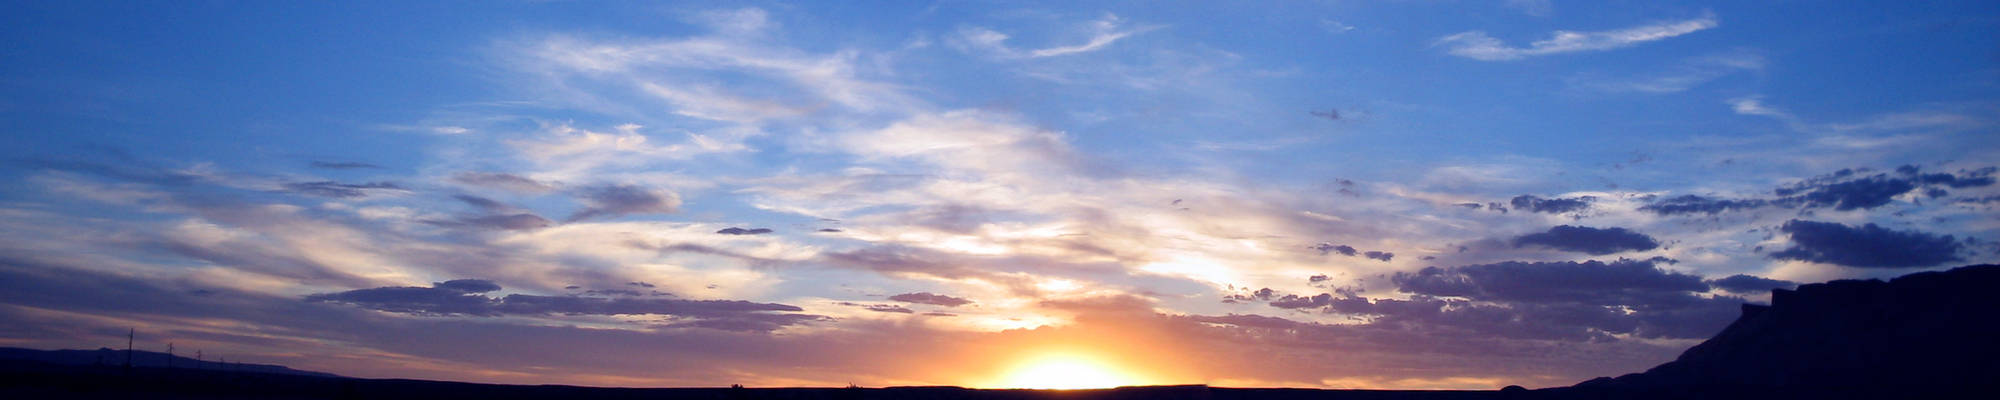 Sunset-Quad Display by mrmattrice